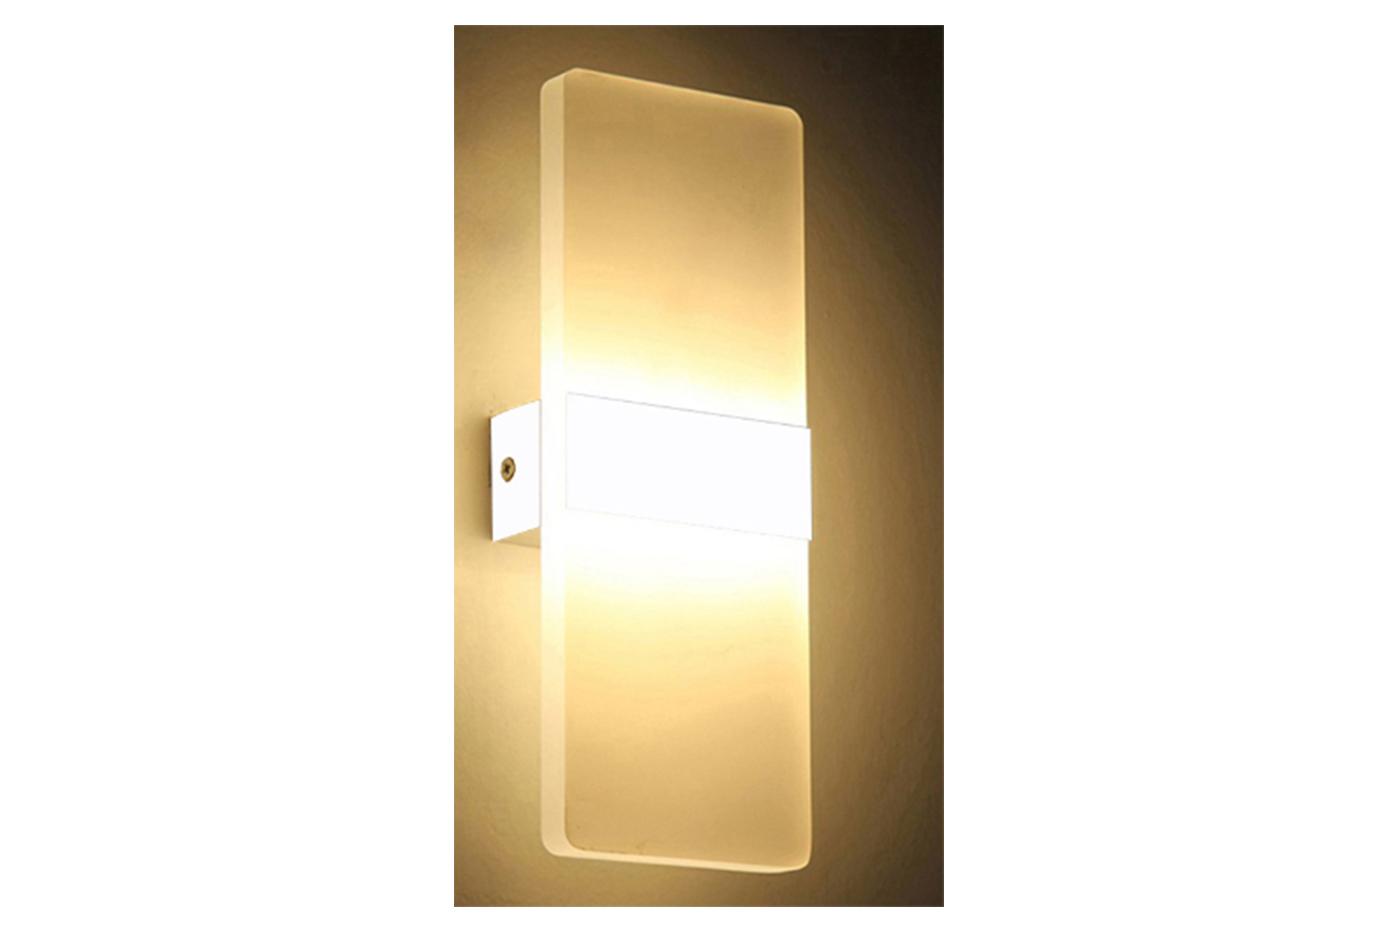 Bes applique beselettronica lampada da parete applique